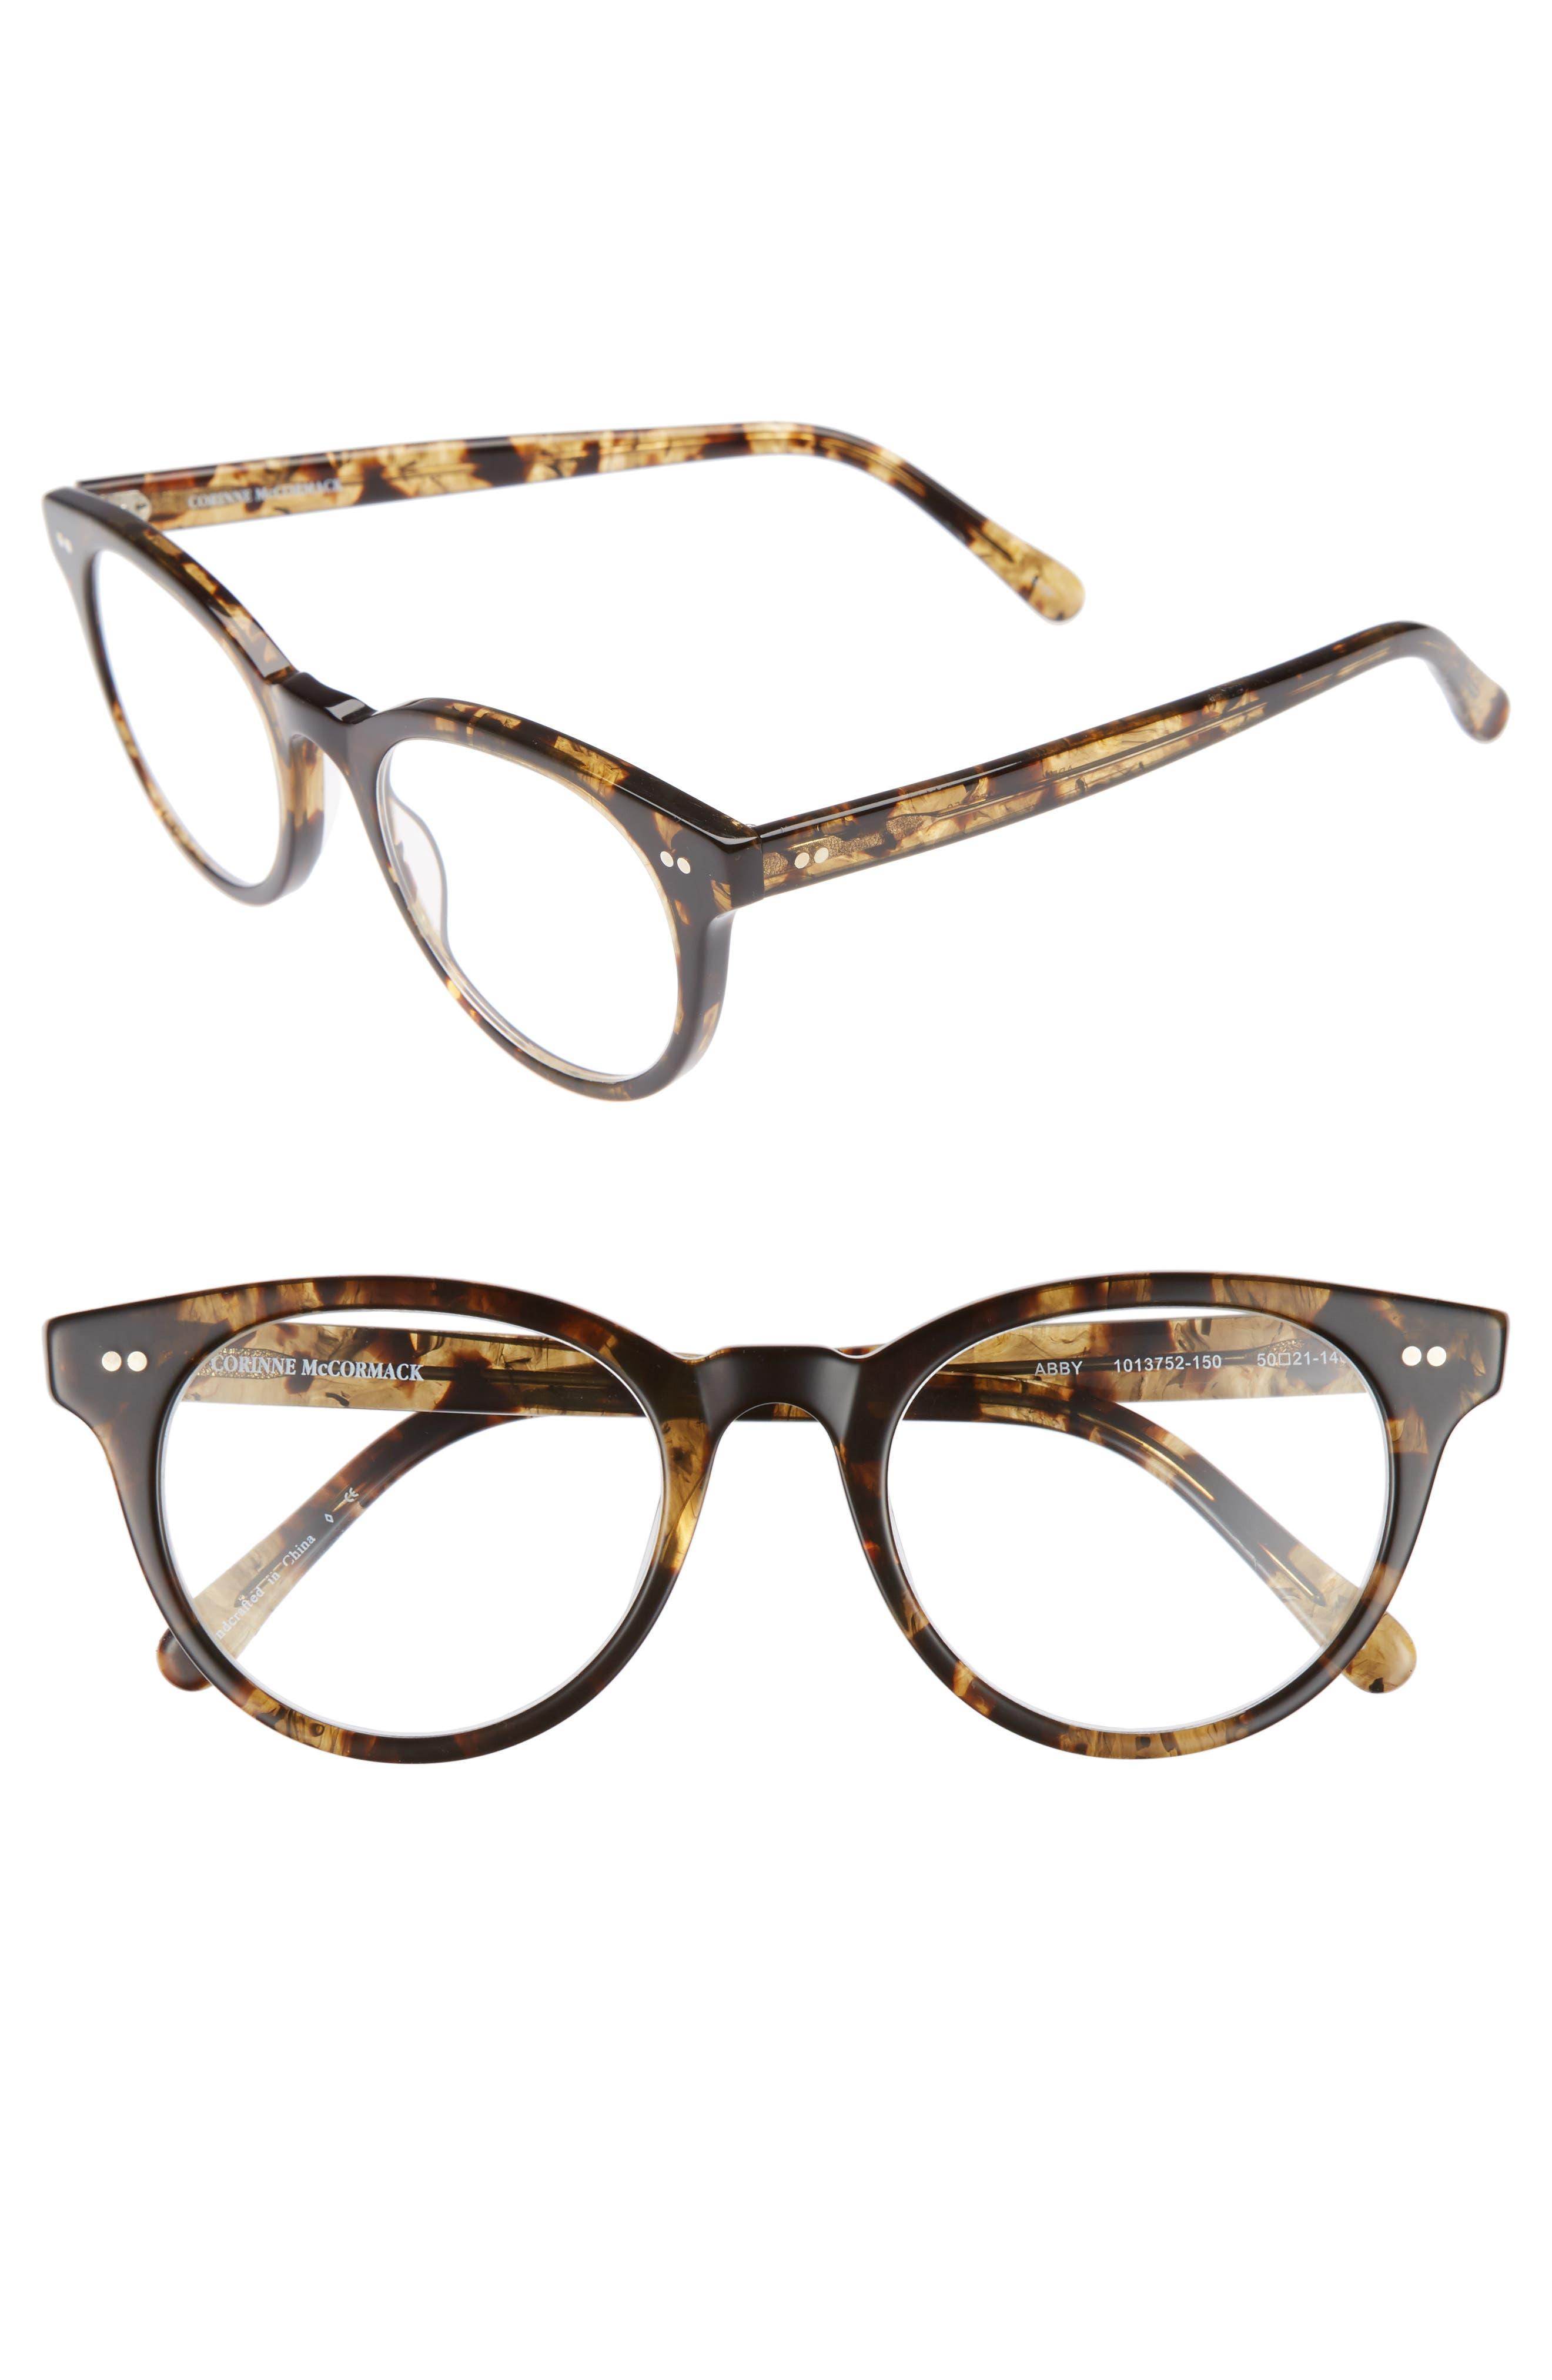 Alternate Image 1 Selected - Corinne McCormack Abby 50mm Reading Glasses